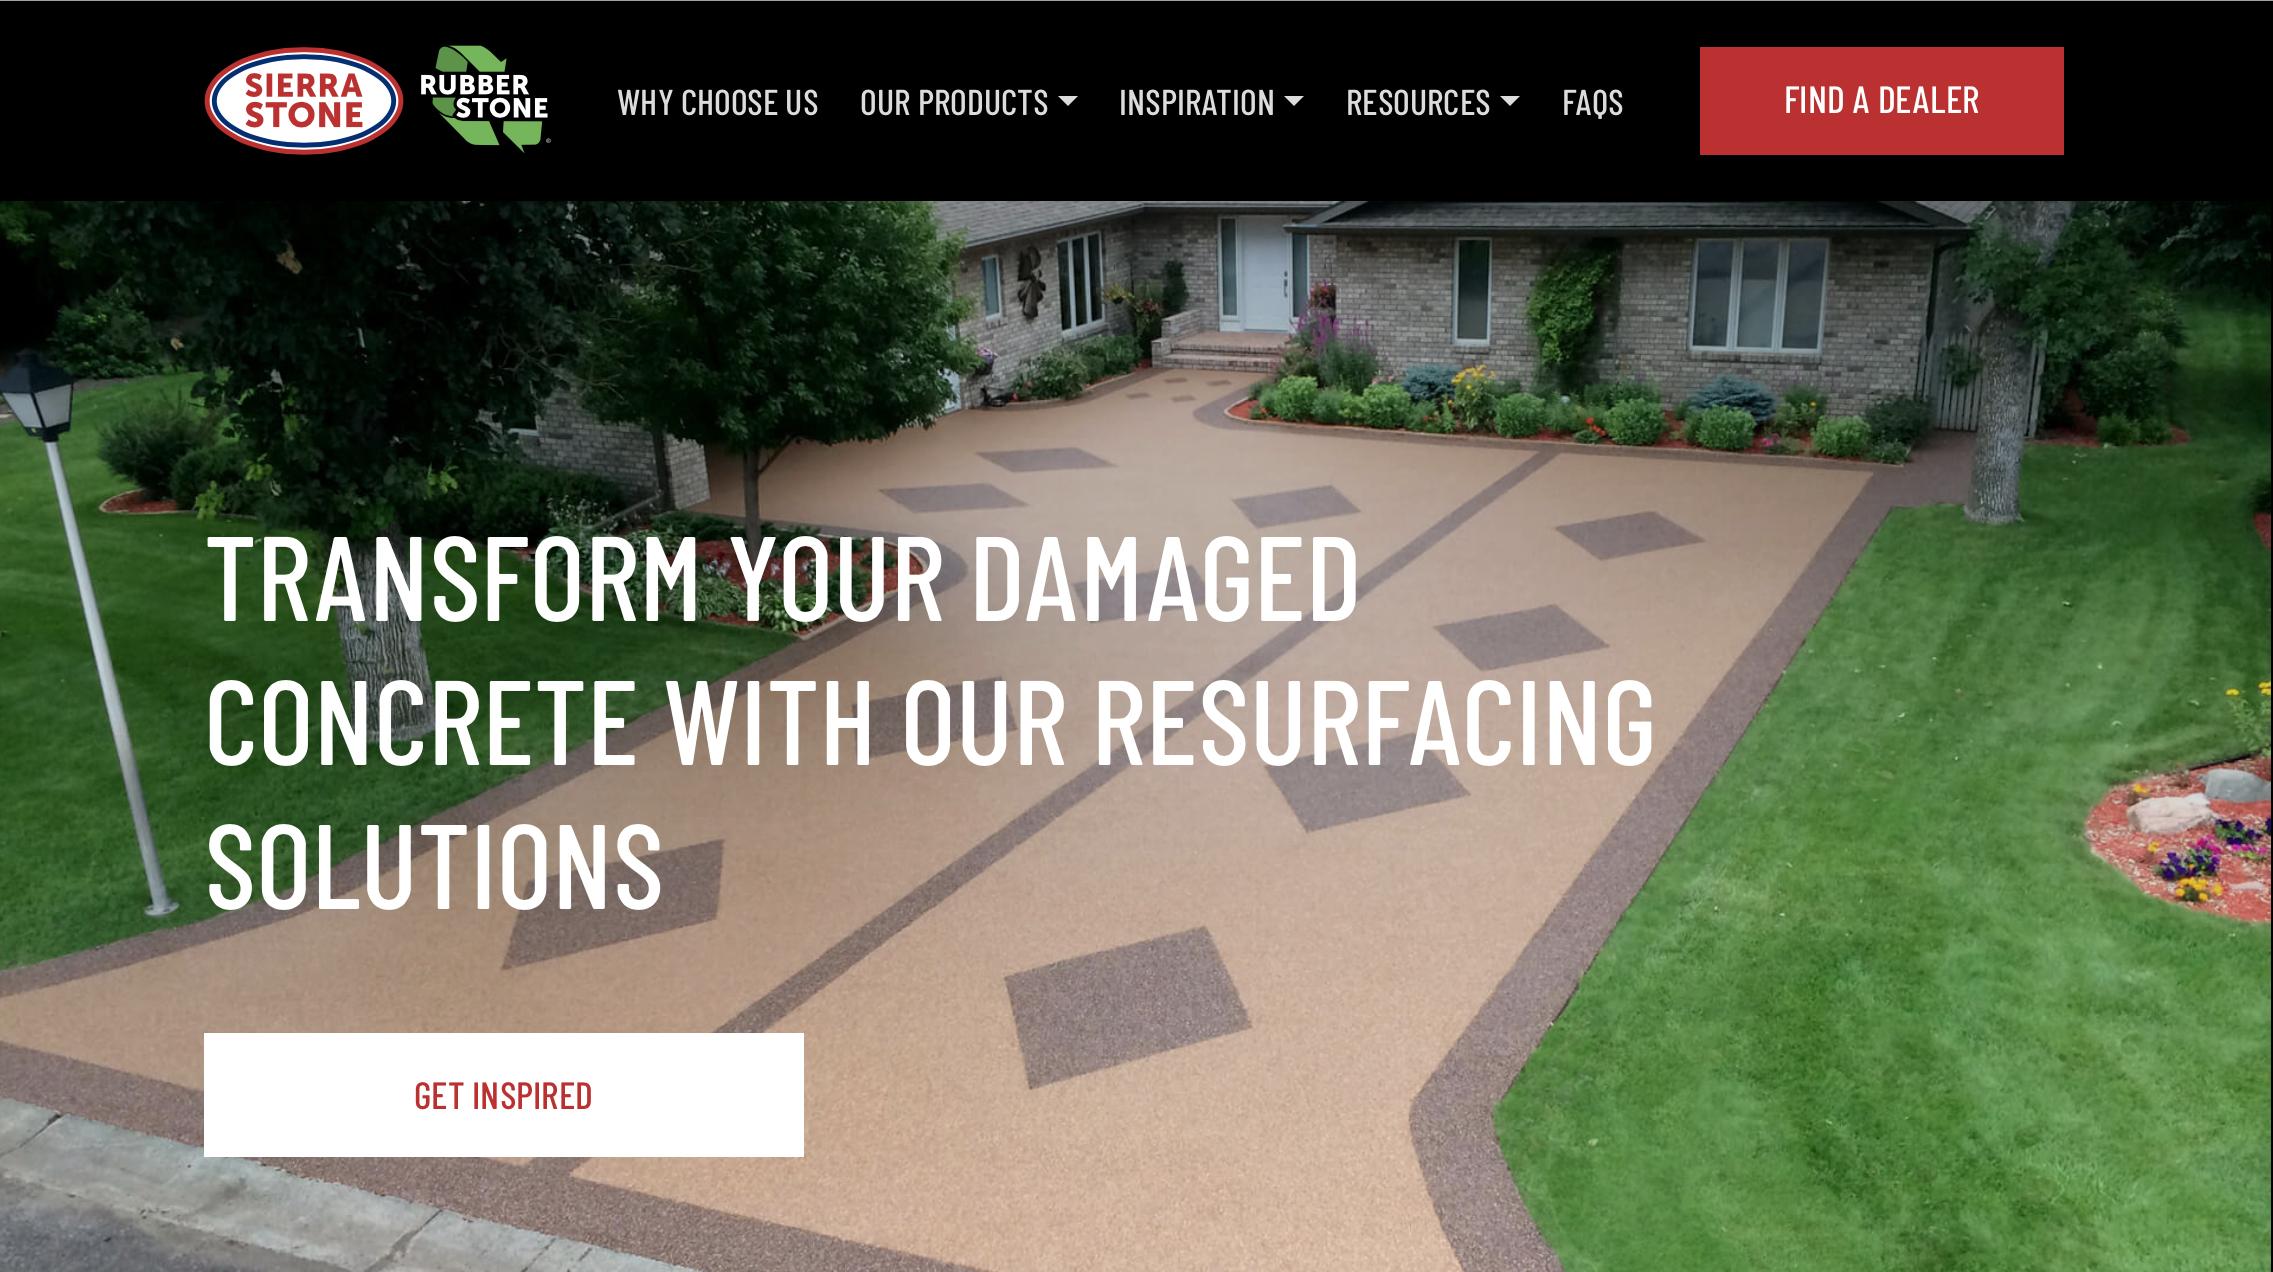 Sierra stone web home page.jpg